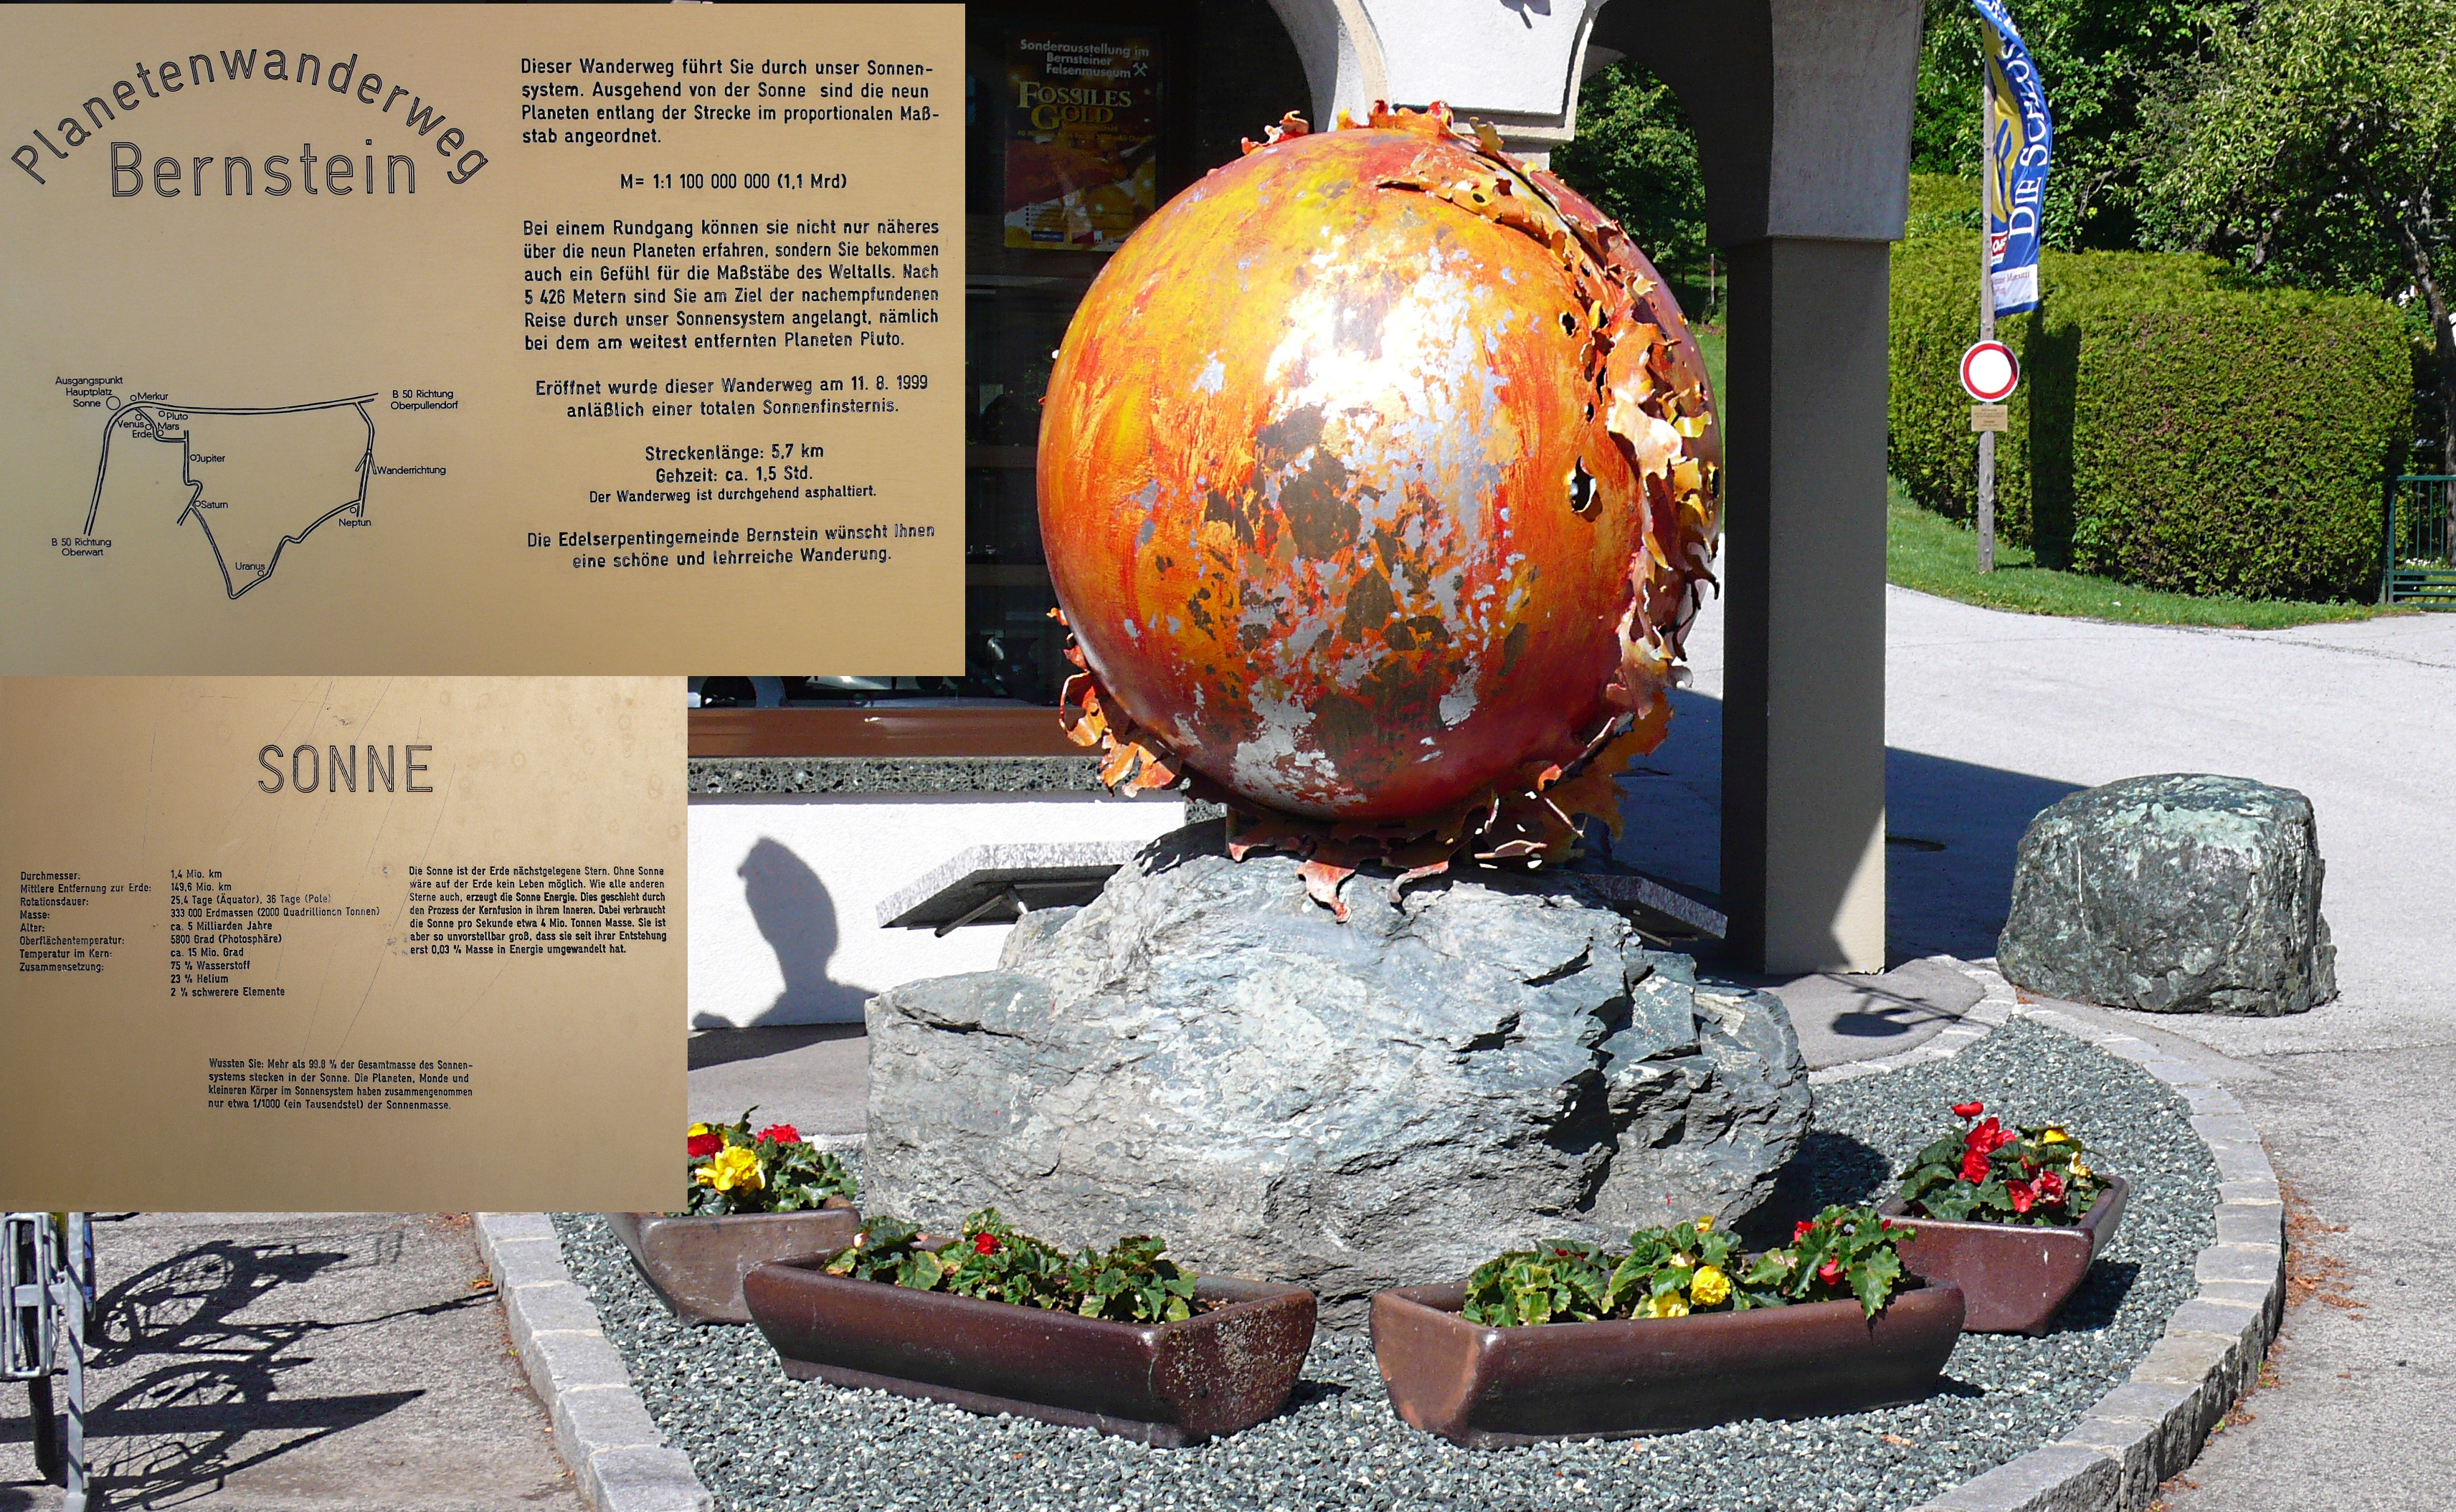 Alle Anderen 2009 file:planetenwanderweg - wikimedia commons